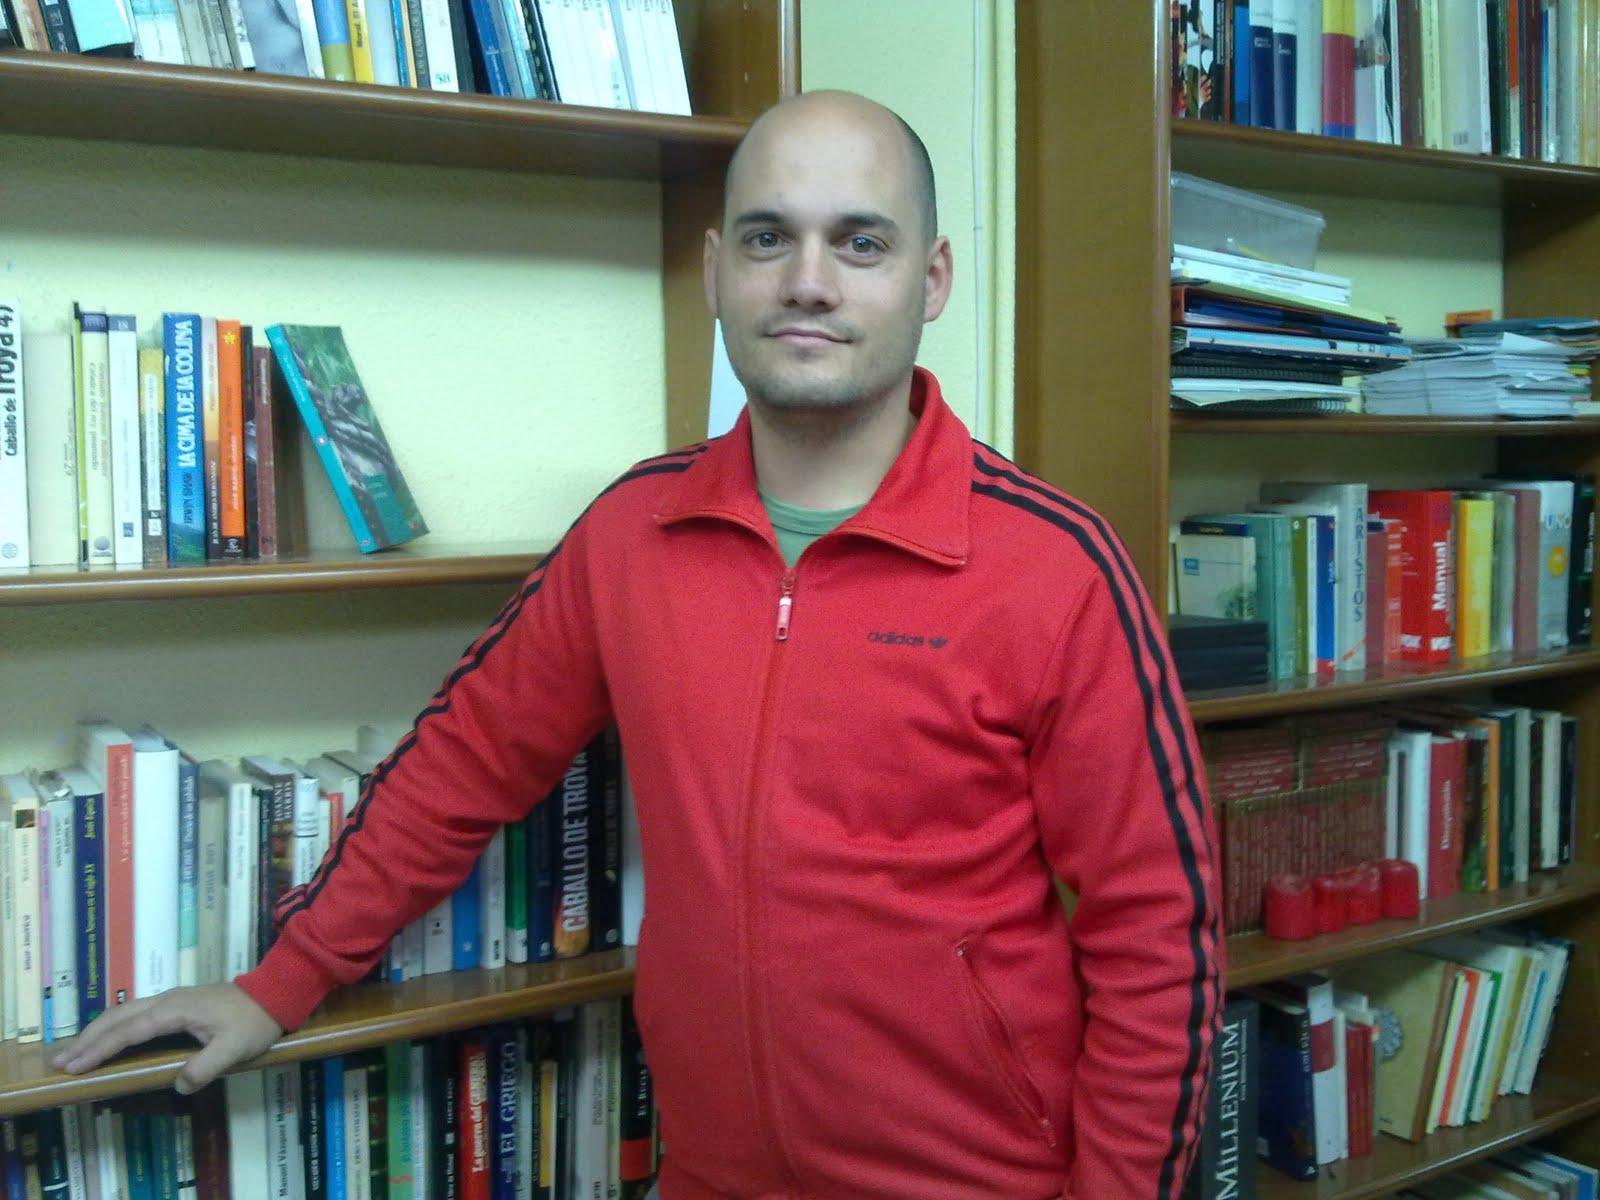 Jose MAria Collado Reelegido presidente de CAVECAL